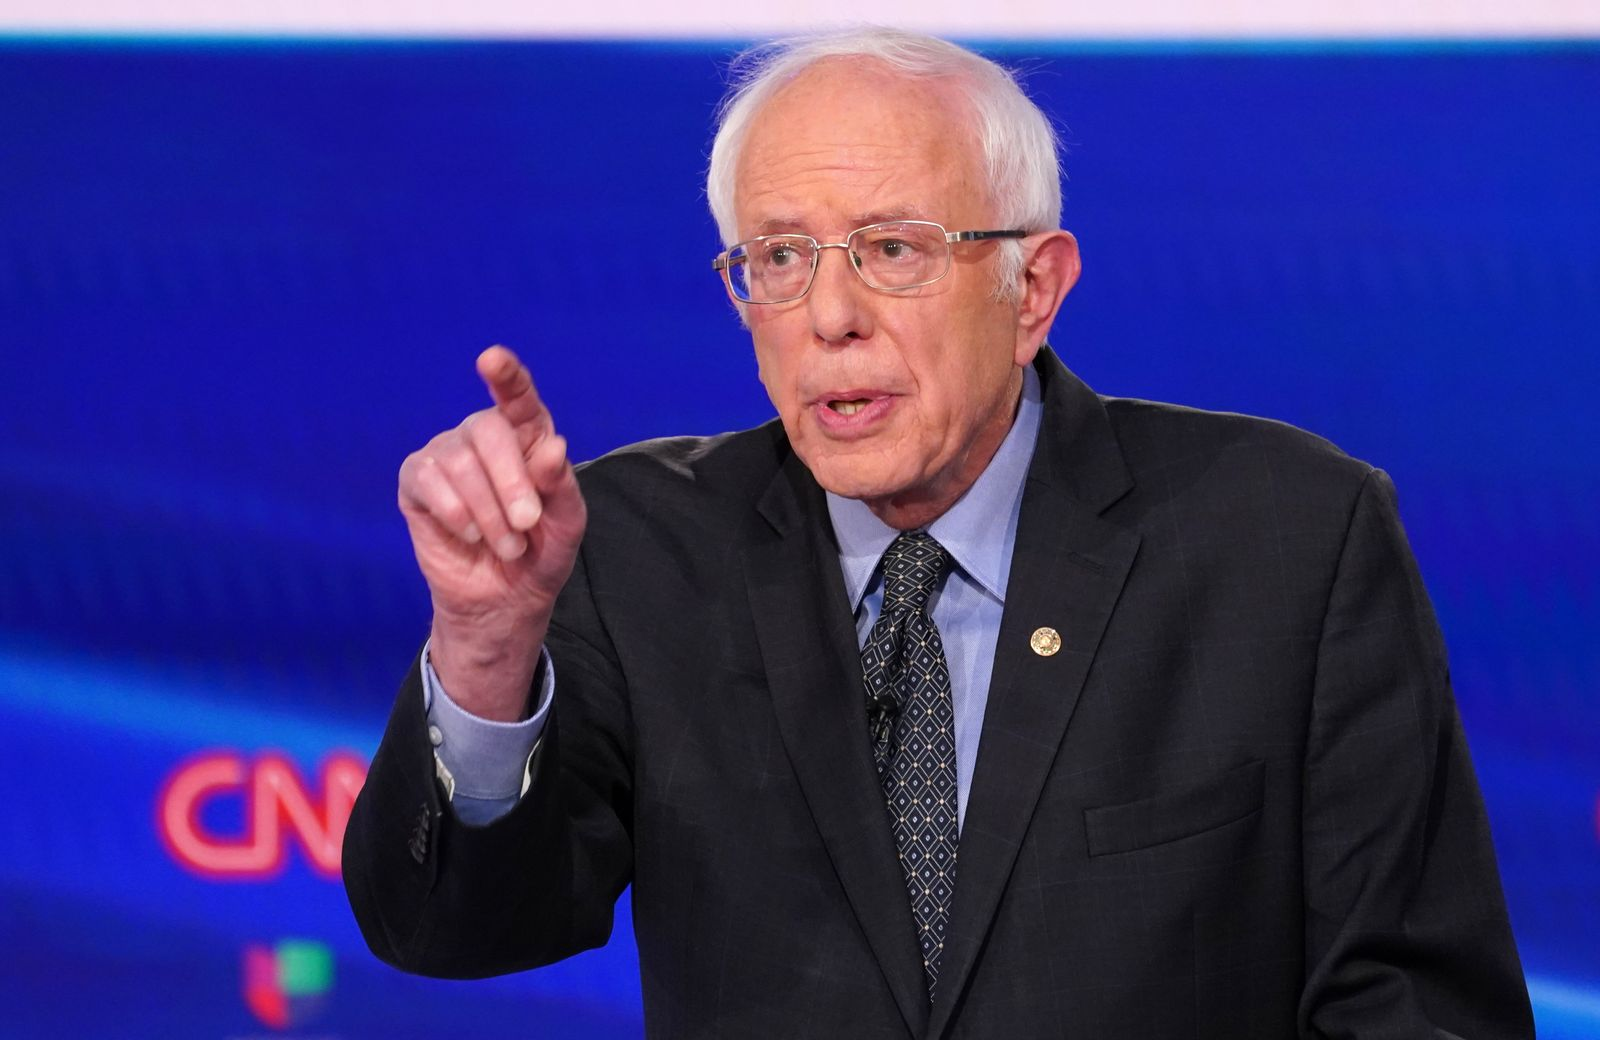 Democratic U.S. presidential candidate Senator Bernie Sanders speaks at the 11th Democratic candidates debate of the 2020 U.S. presidential campaign in Washington